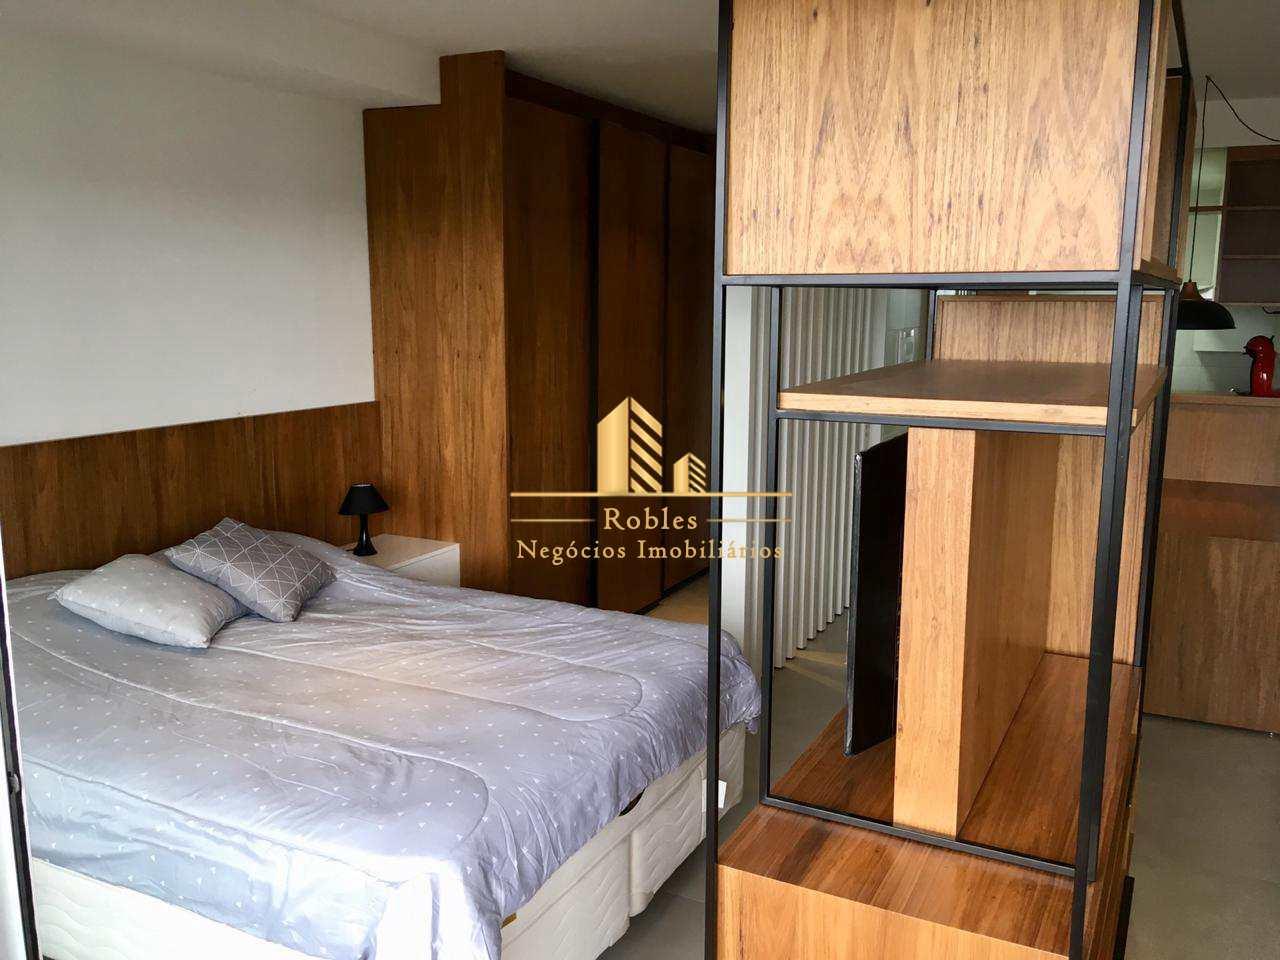 Apartamento com 1 dorm, Granja Julieta, São Paulo - R$ 650 mil, Cod: 1110